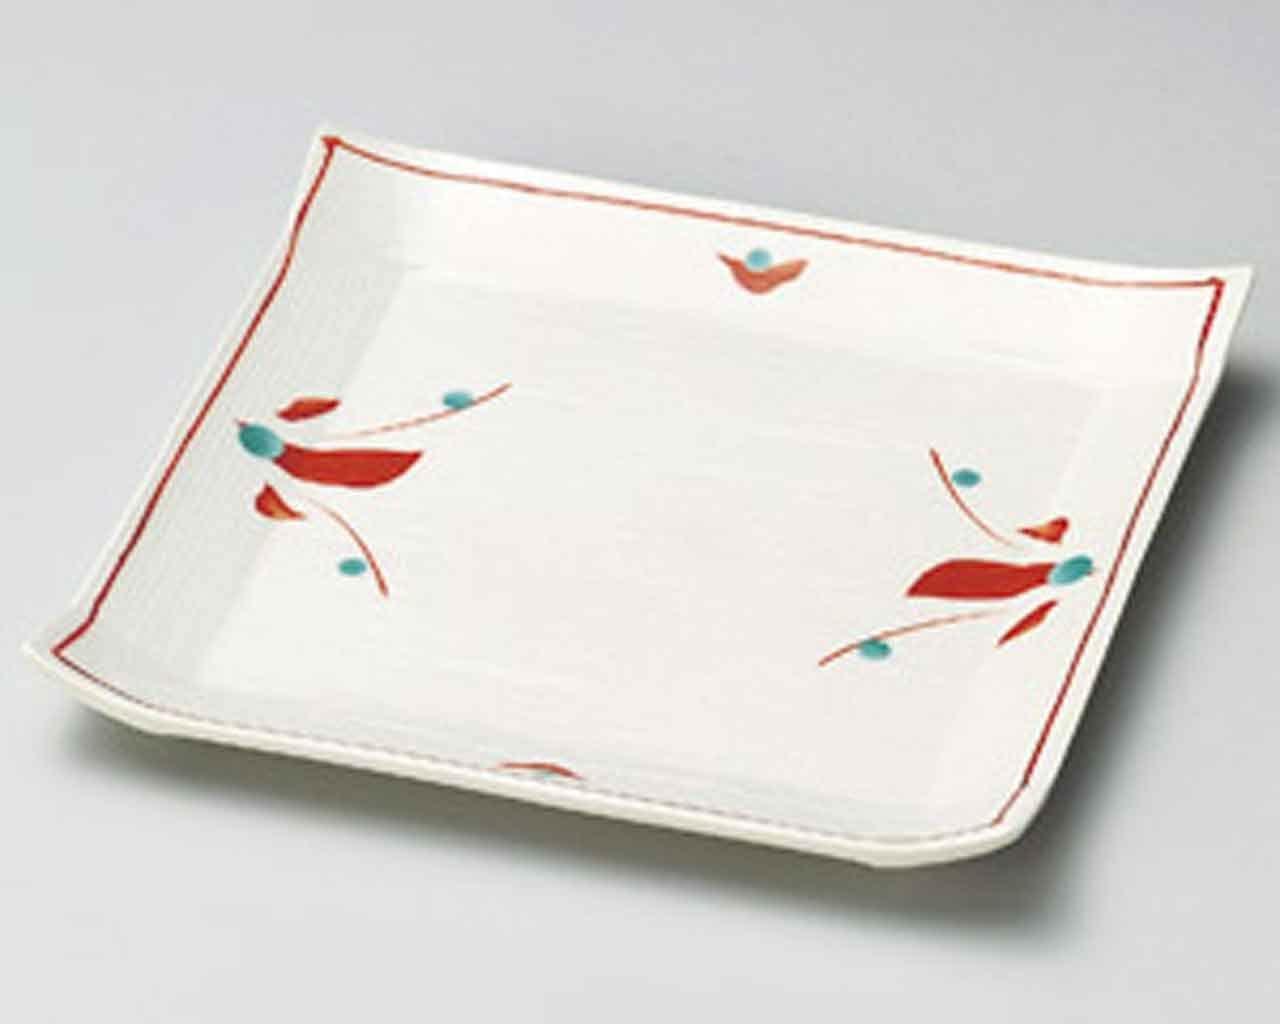 Akae Flower 6.5inch Set of 2 Small Plates White Ceramic Made in Japan